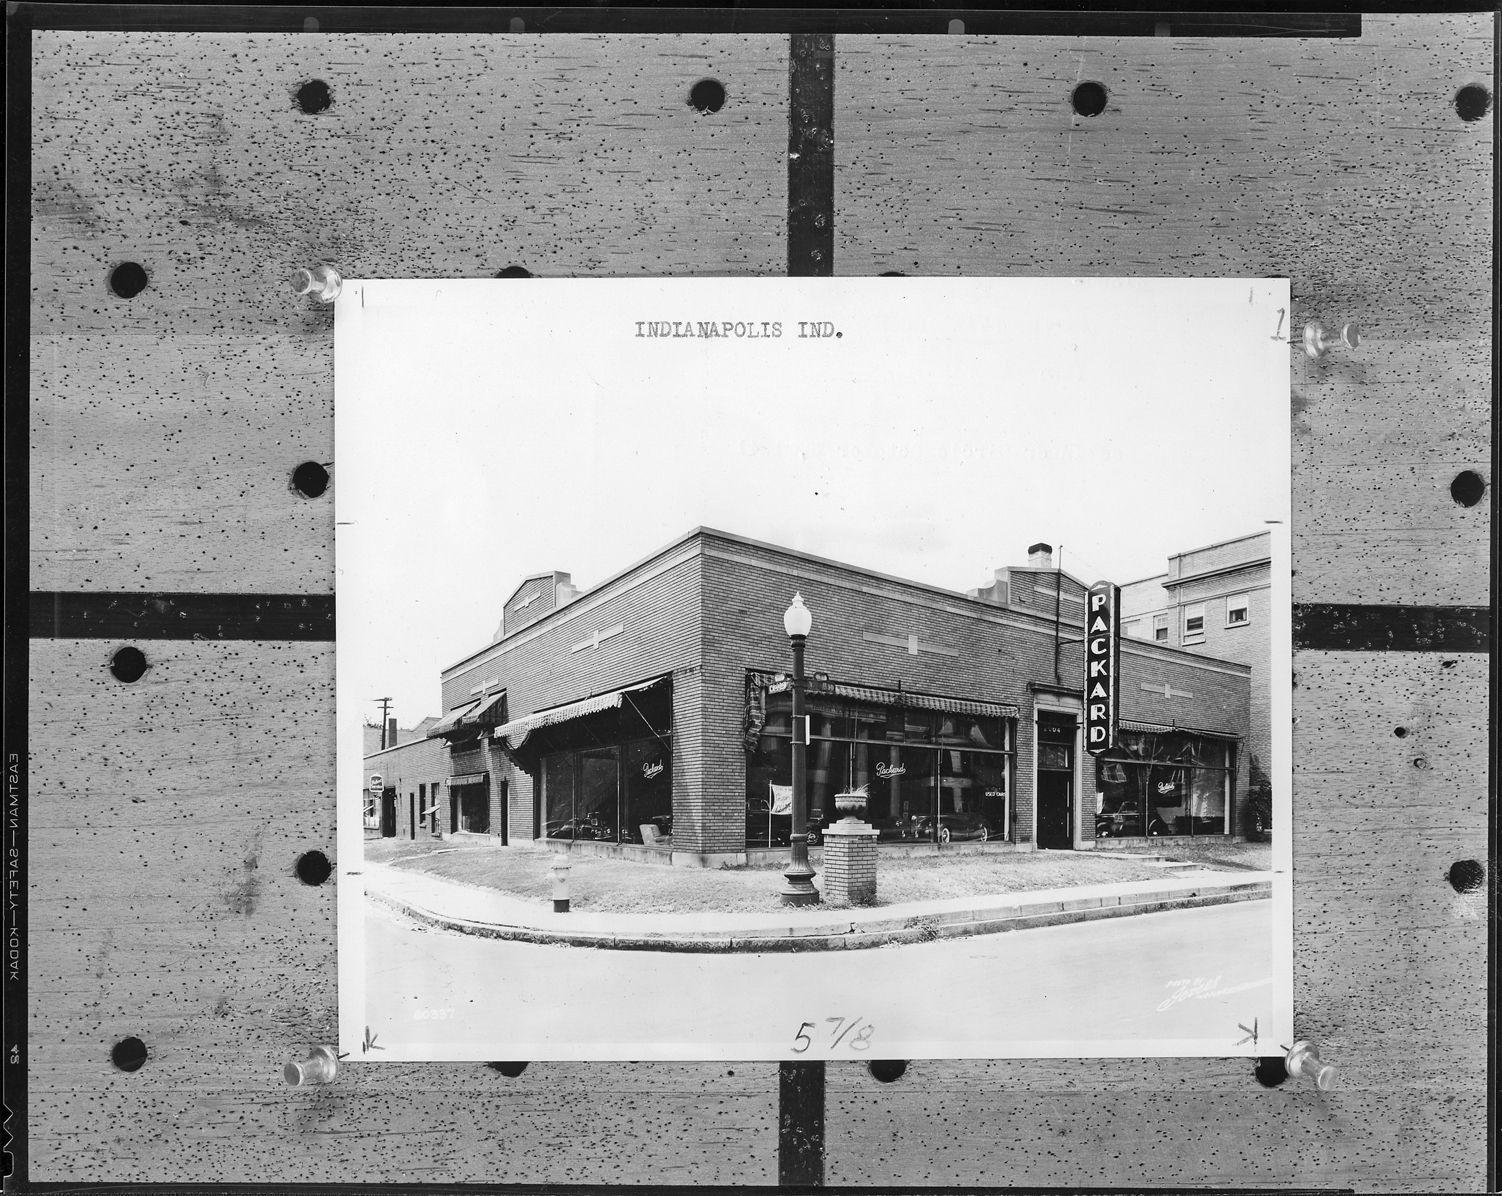 Packard dealership, Indianapolis, Indiana, 1941 DPL DAMS